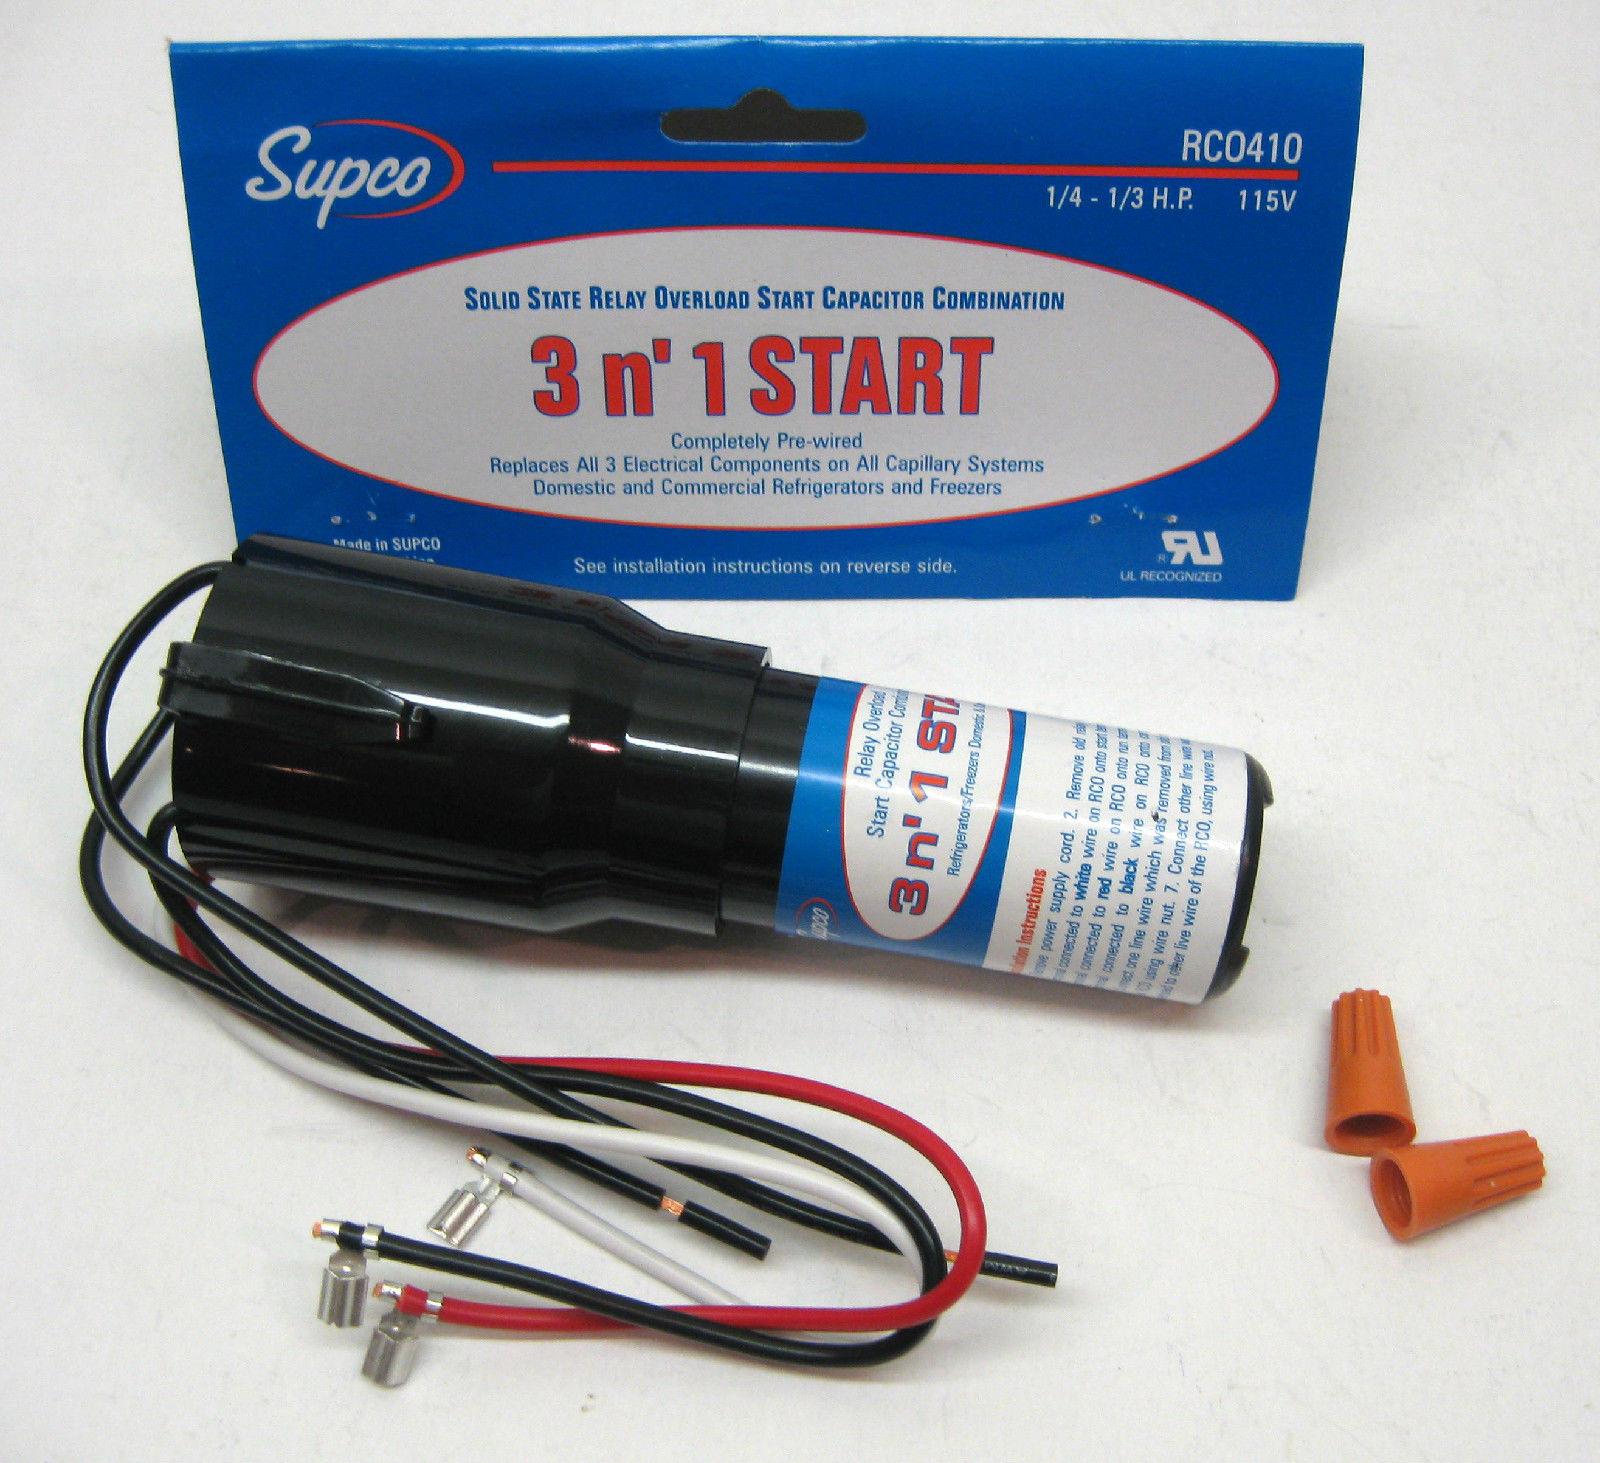 Rc0410 Supco Refrigerator Relay Overload Start Run Capacitor 1/4 1/3 - Start Run Capacitor Wiring Diagram